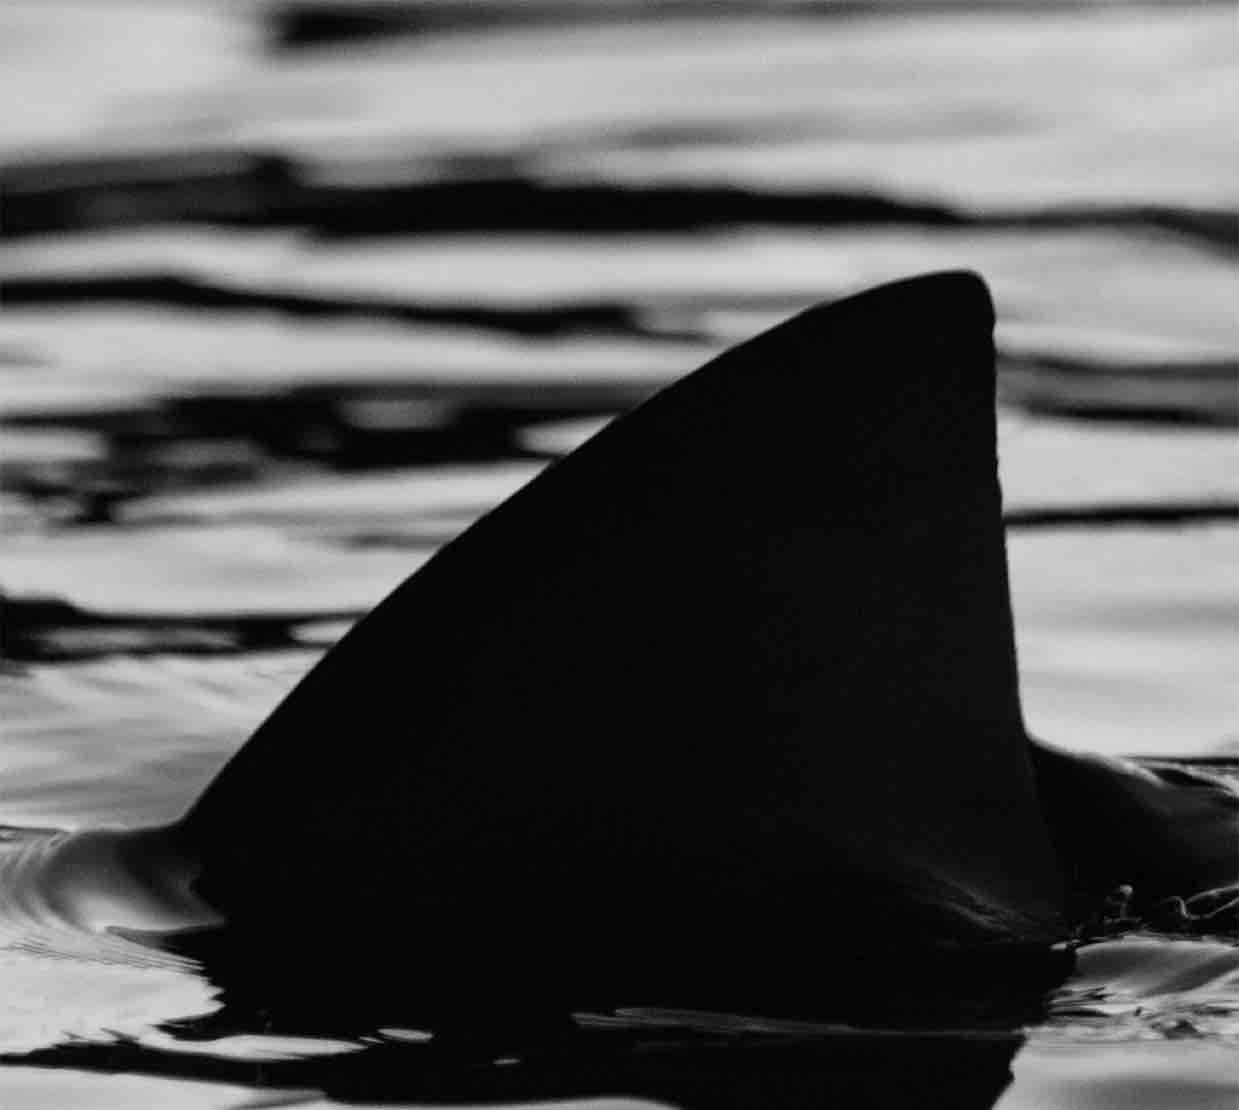 SharkPoker